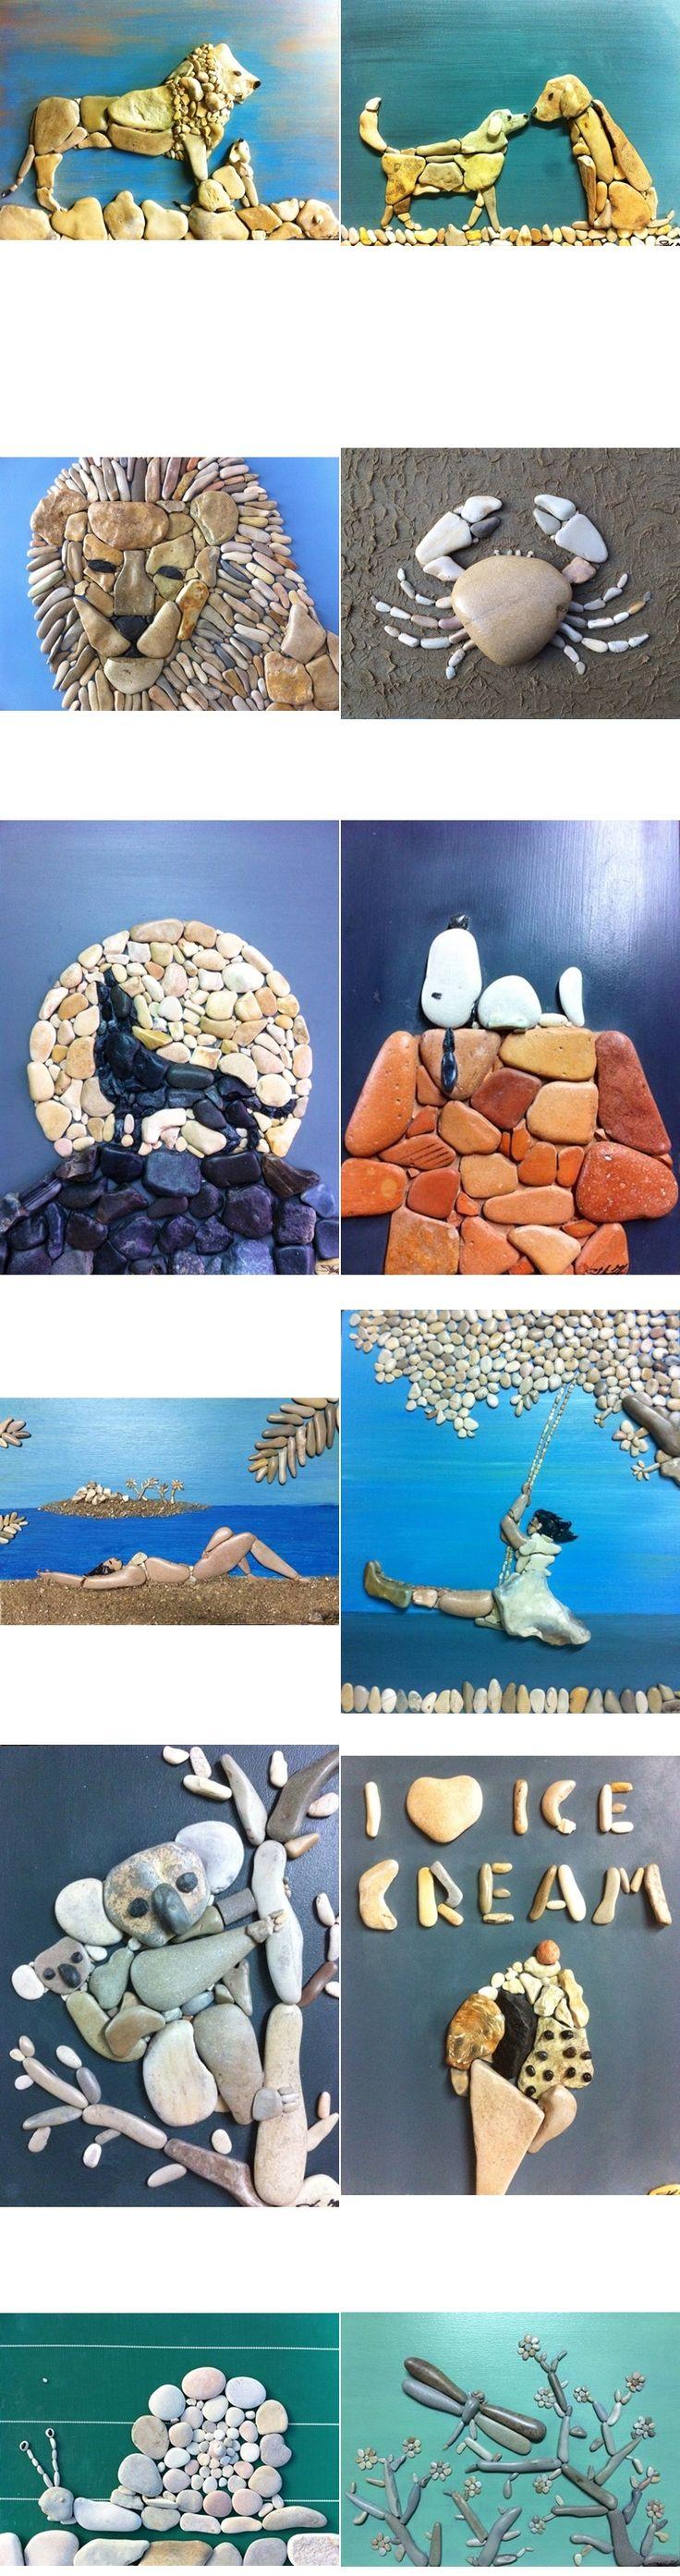 Fab ideas on Stone Art Design | www.FabArtDIY.com LIKE Us on Facebook ==> https://www.facebook.com/FabArtDIY